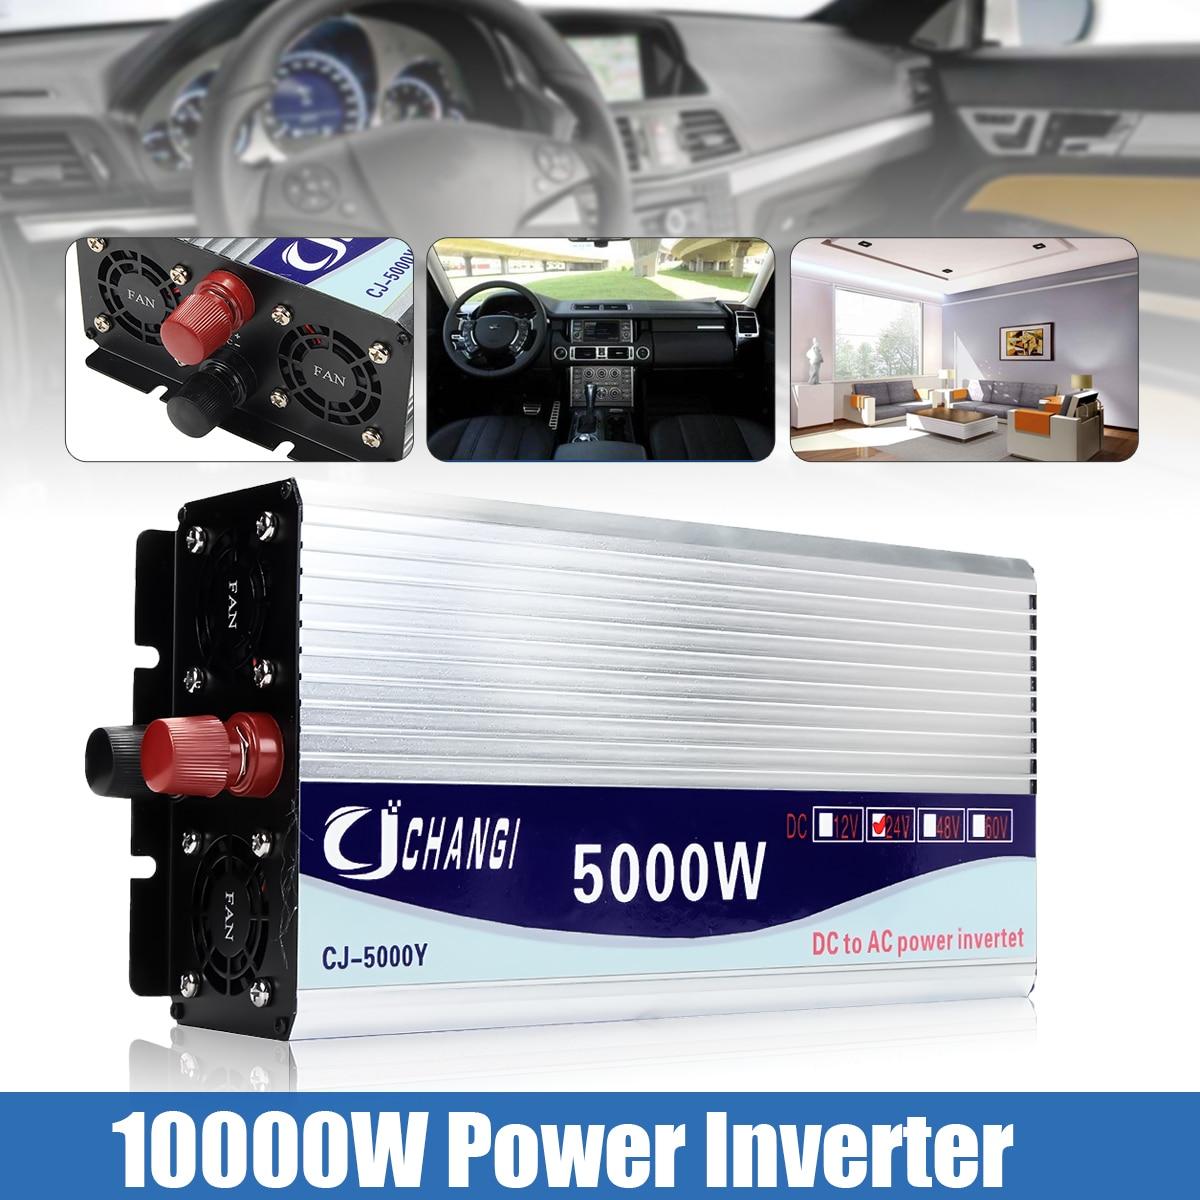 цена на Inverter 12V/24V/48V 220V 5000W 10000W P eak Modified Sine Wave Power Voltage transformer Inverter Converter + LCD display